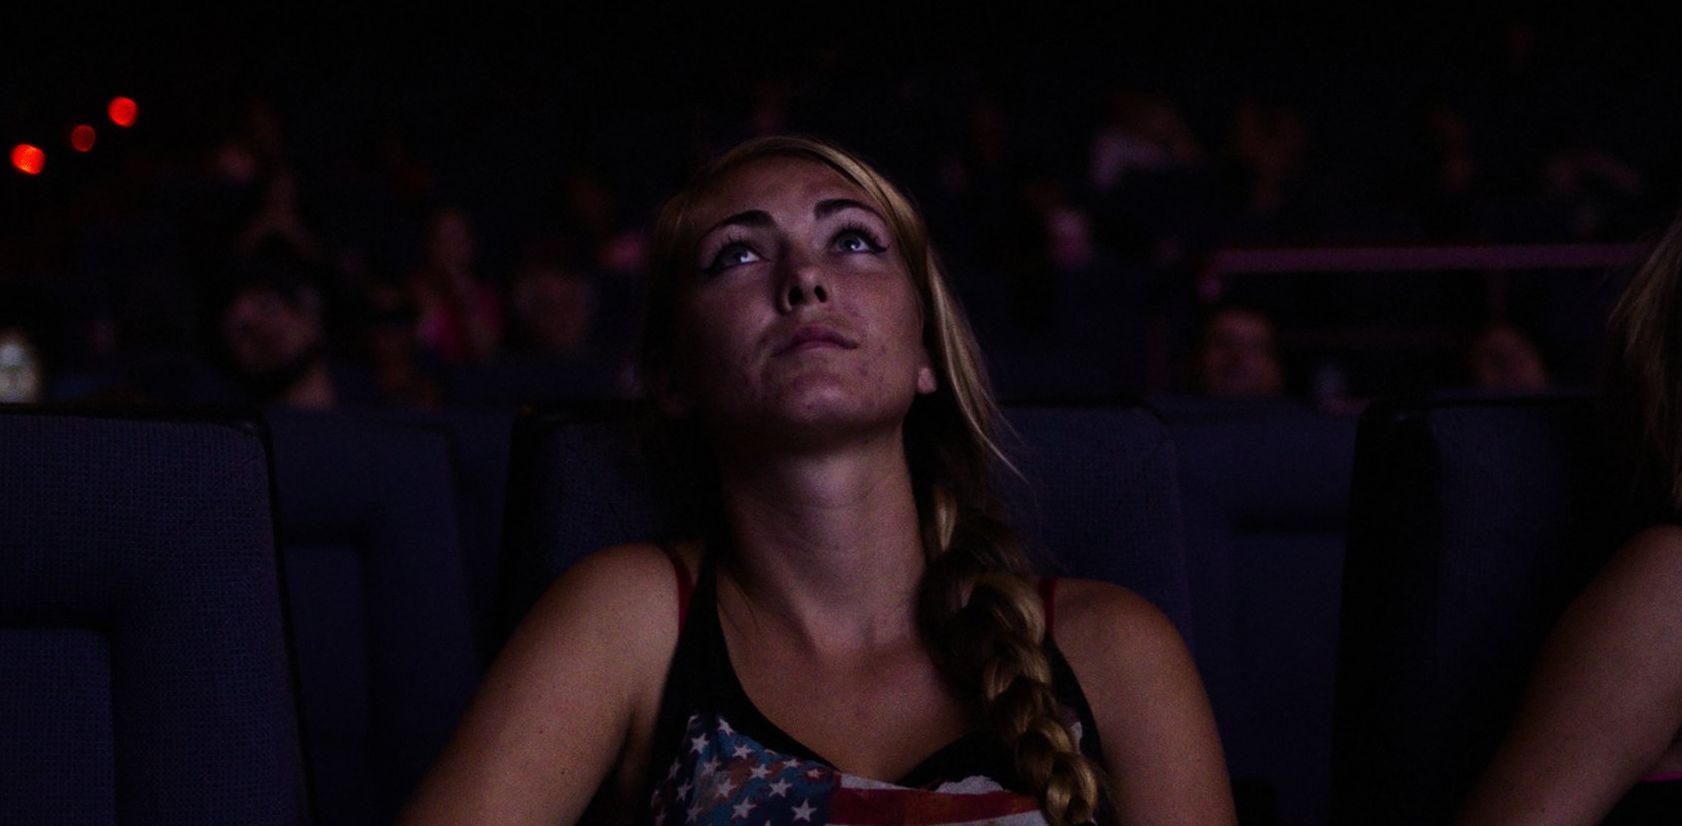 Tim Sutton's 'Dark Night' tells a poetic American nightmare